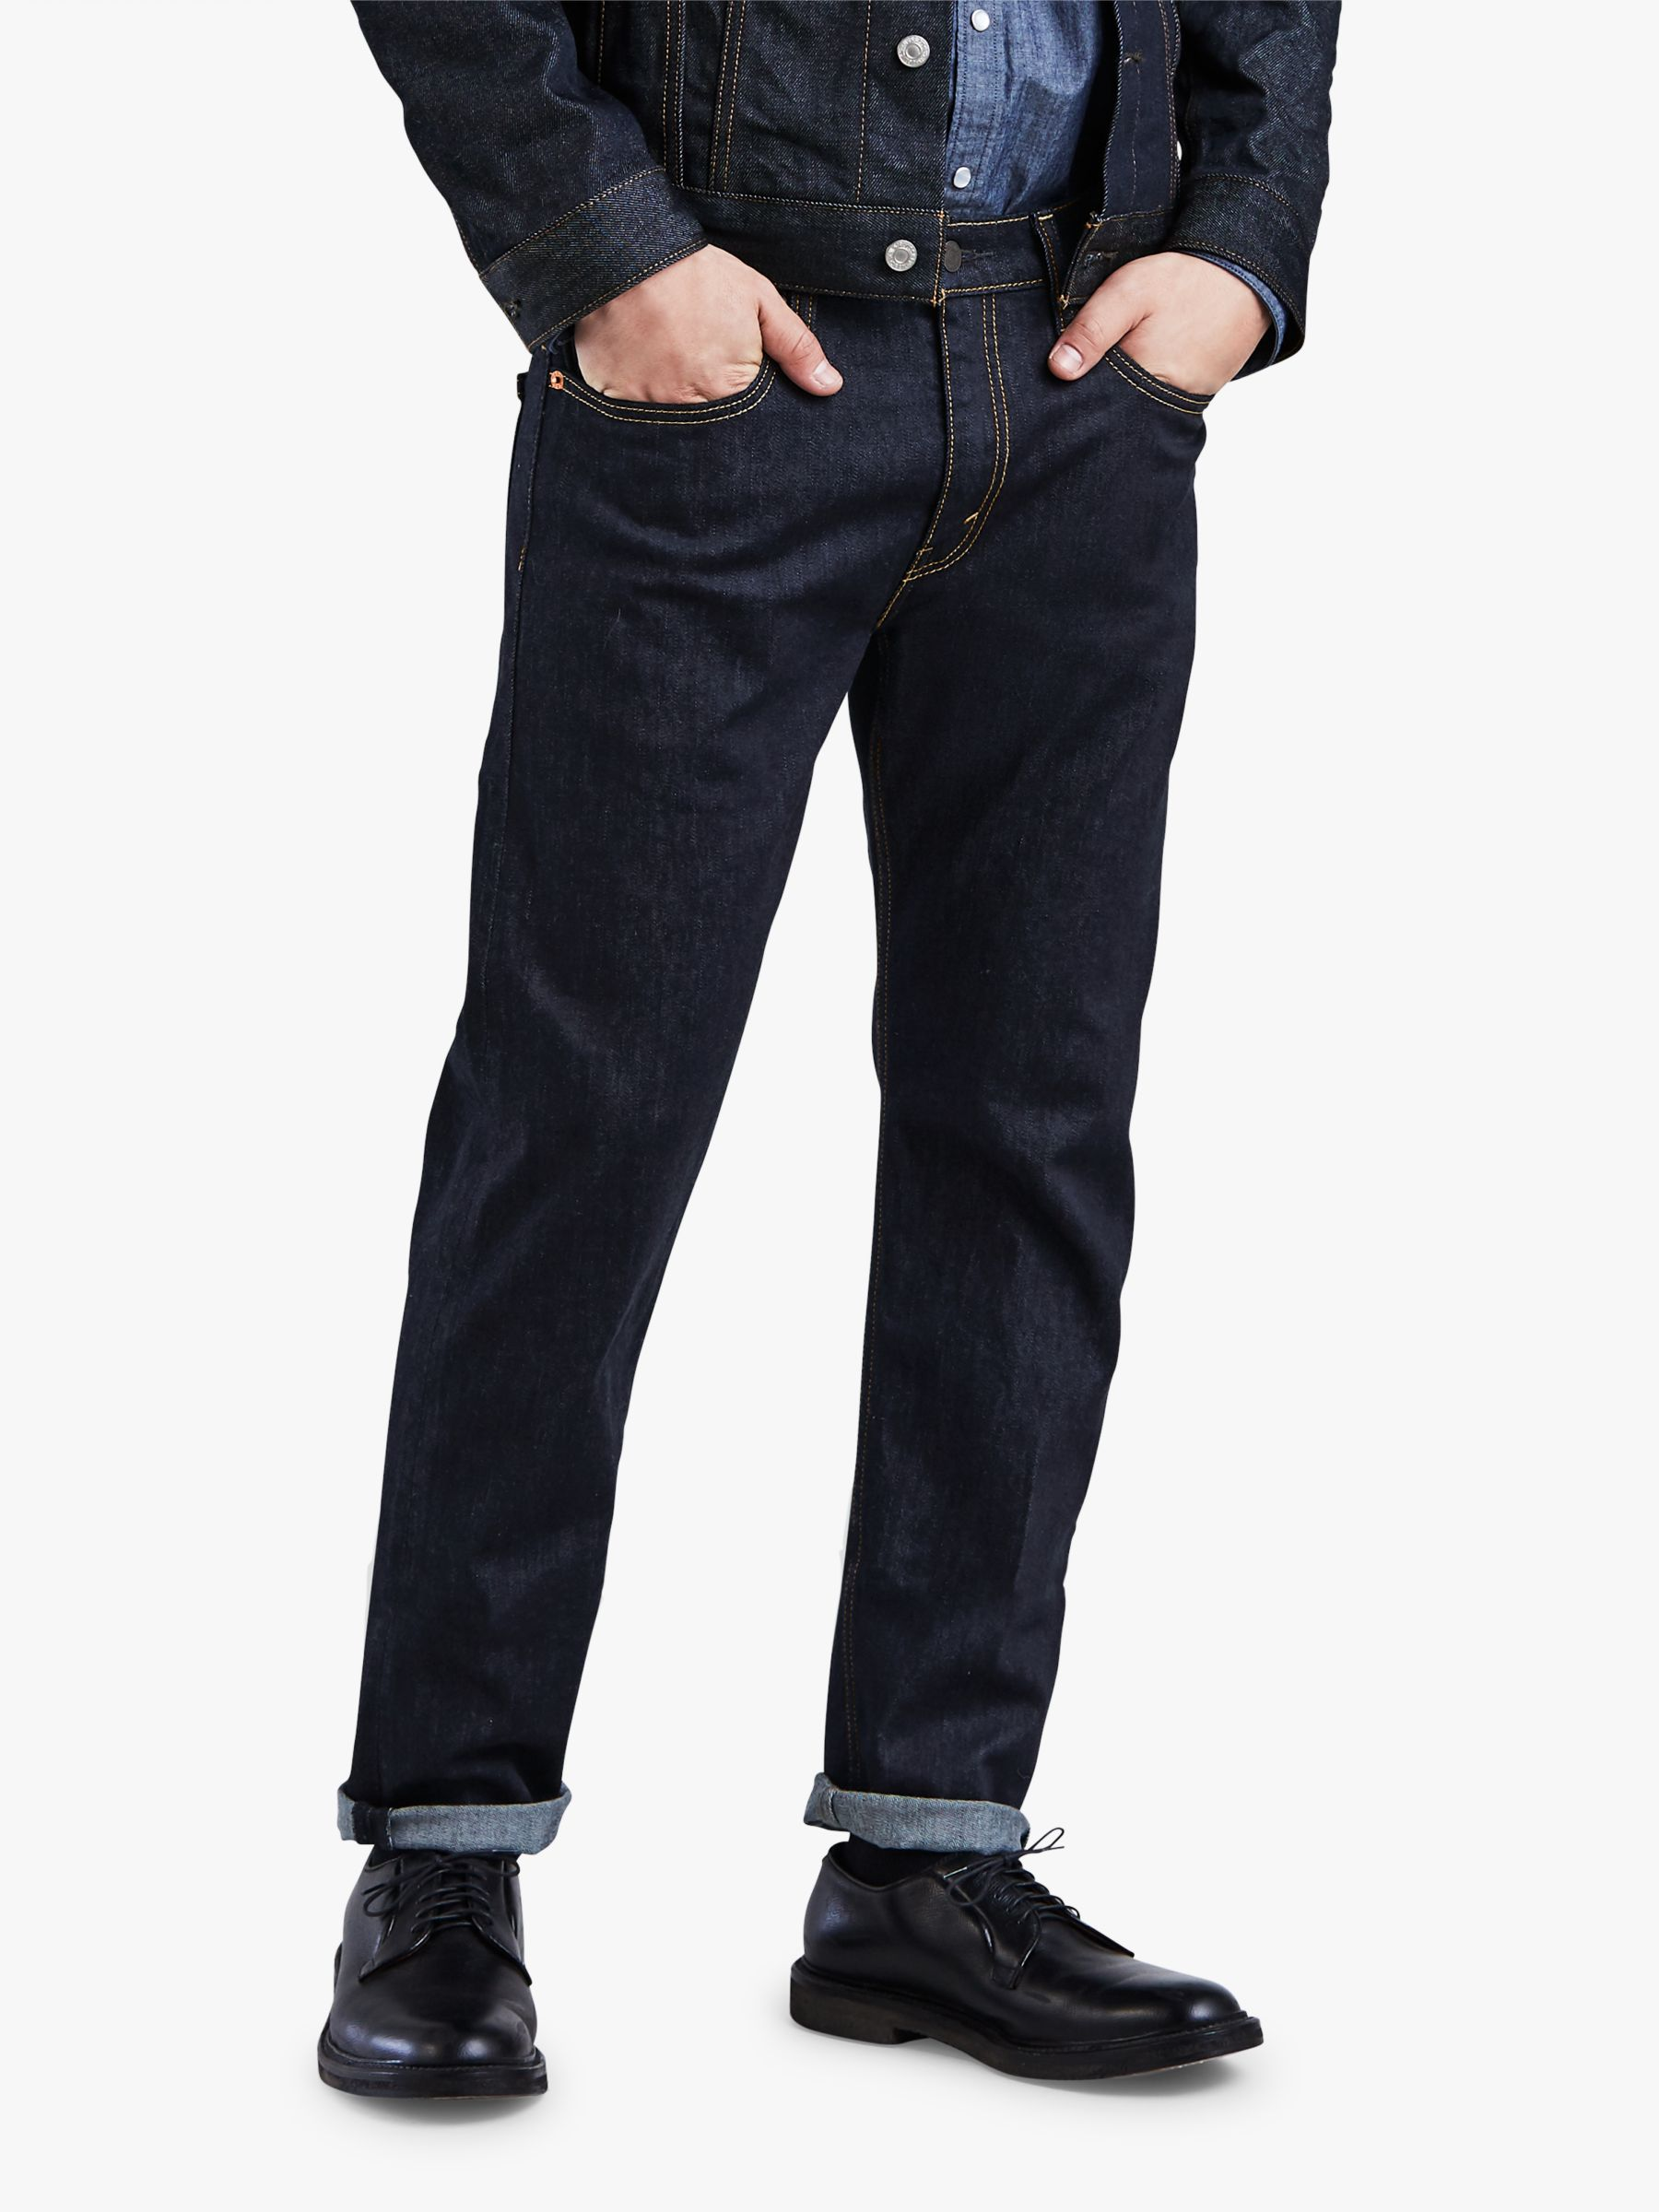 4255fcaf9e9 Levi's 502 Regular Tapered Jeans, Rock Cod at John Lewis & Partners